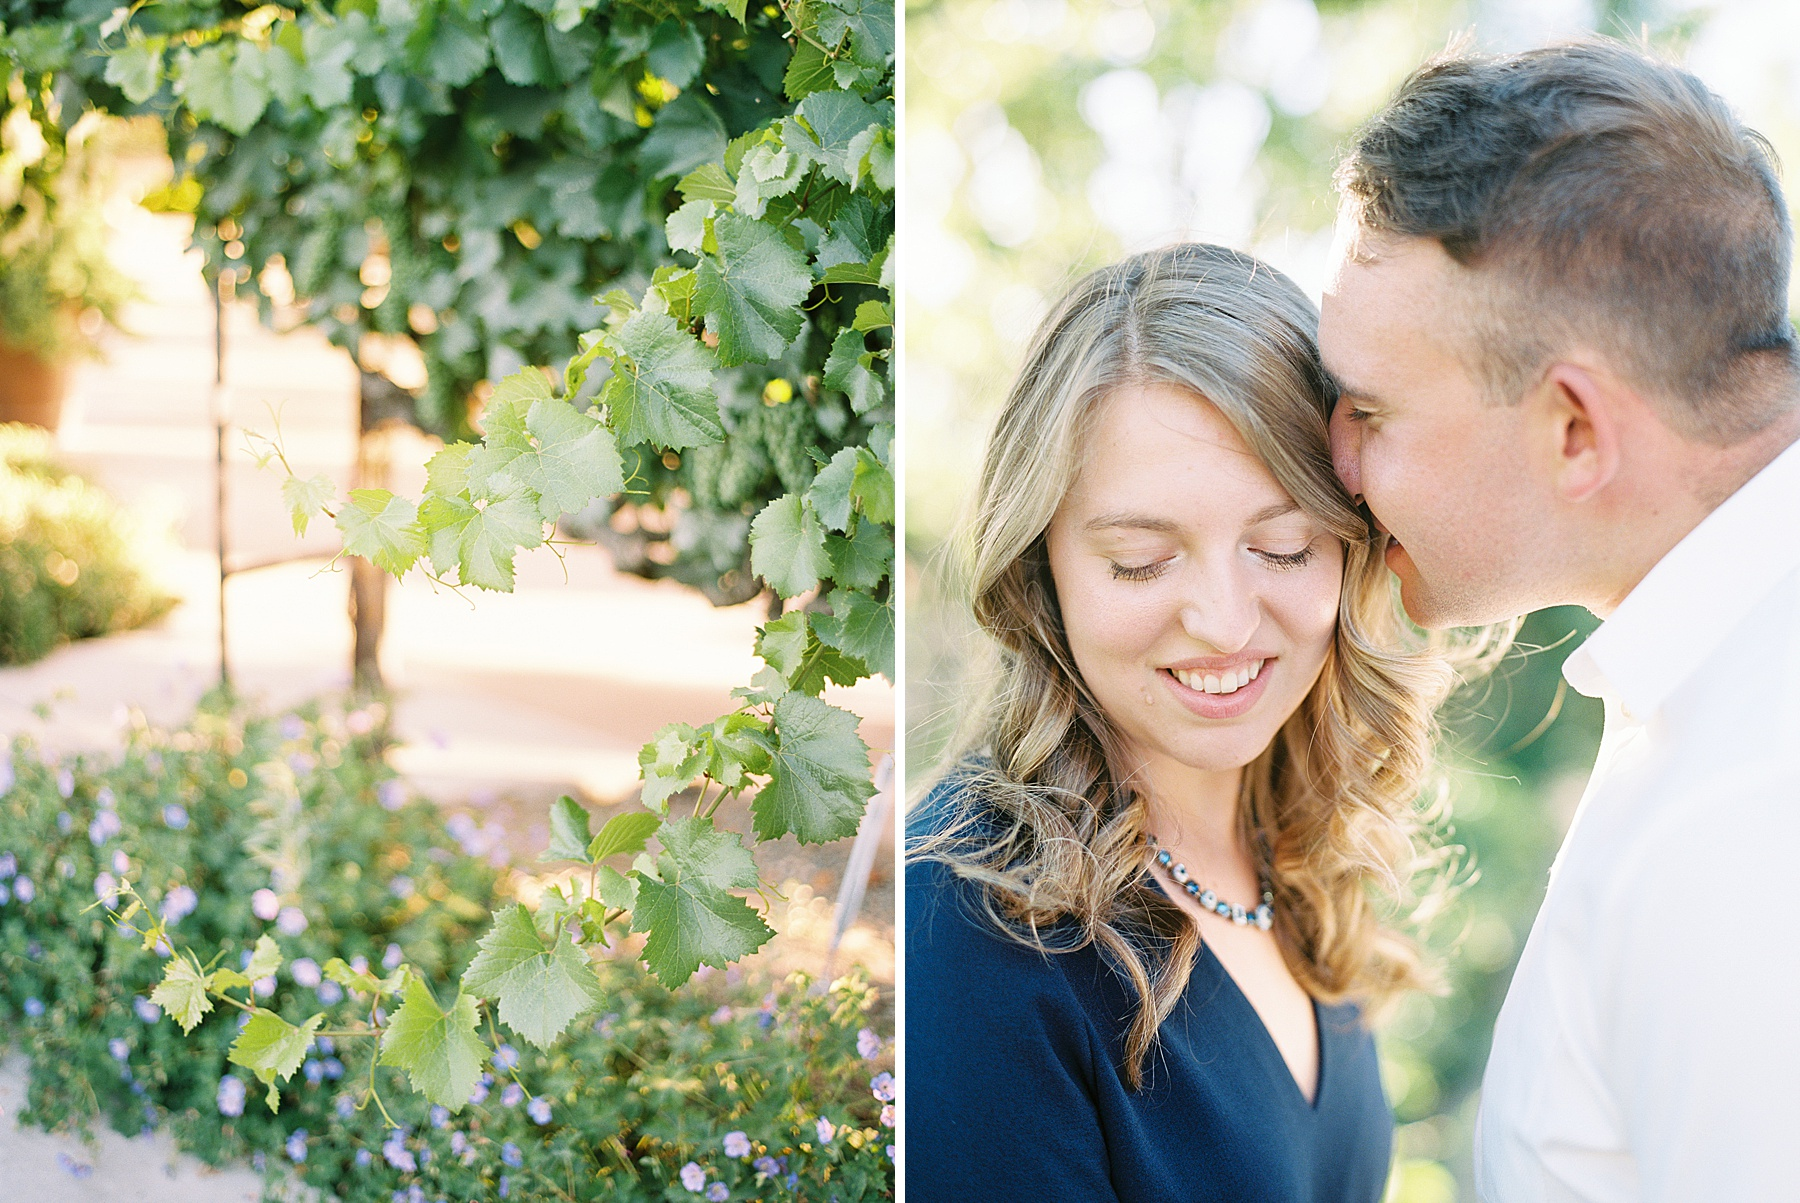 Scribner Bend Winery Engagement Session - Courtney and Steven - Ashley Baumgartner - Sribner Bend Wedding Photographer - Sacramento Wedding Photographer_0002.jpg